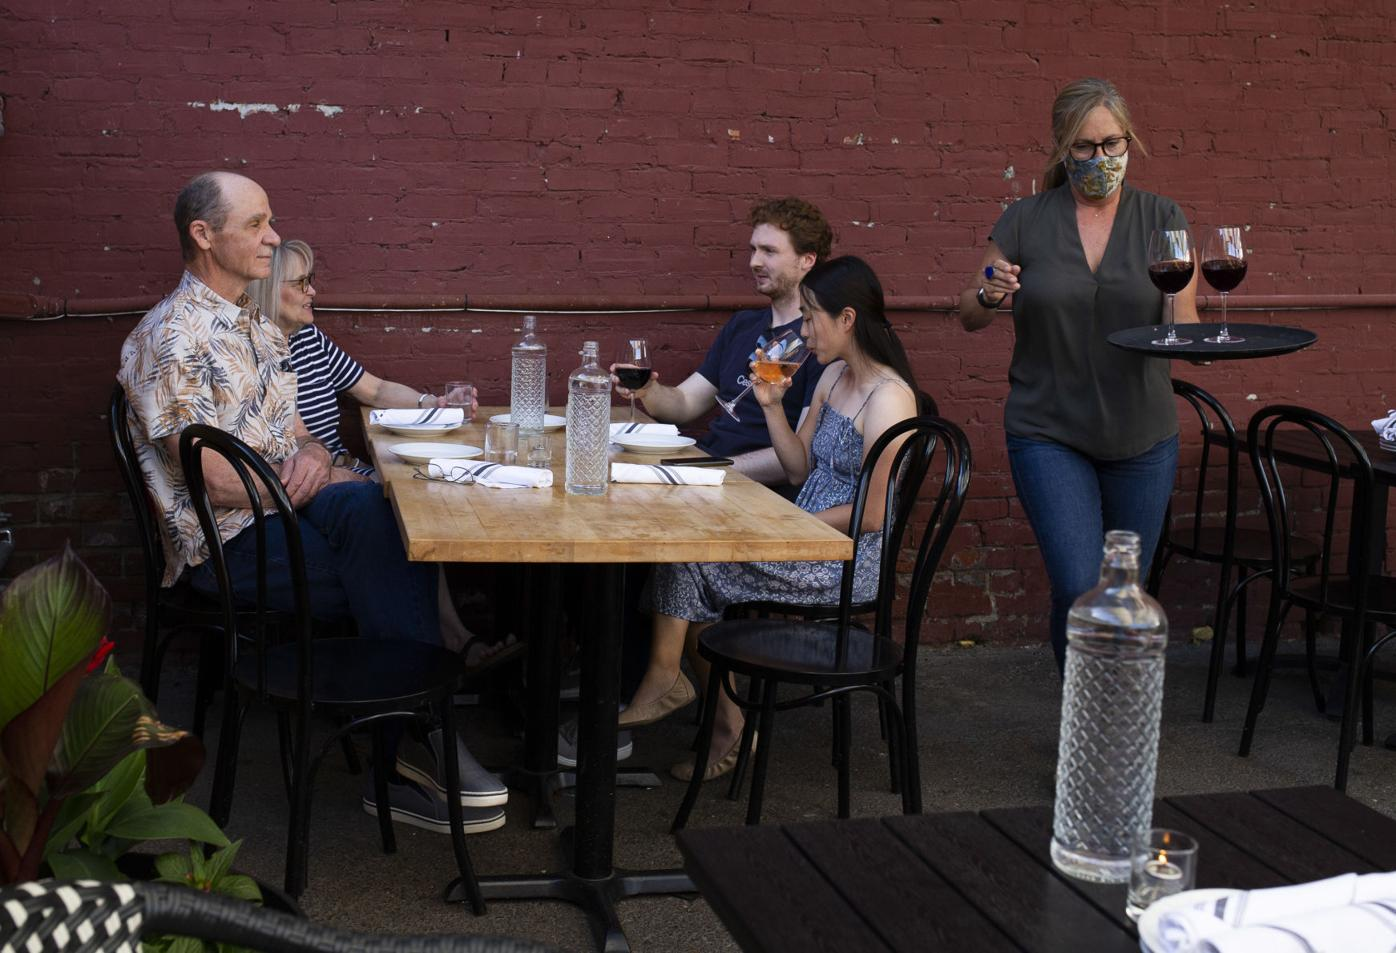 210601-yh-news-restaurantseating-1.jpg